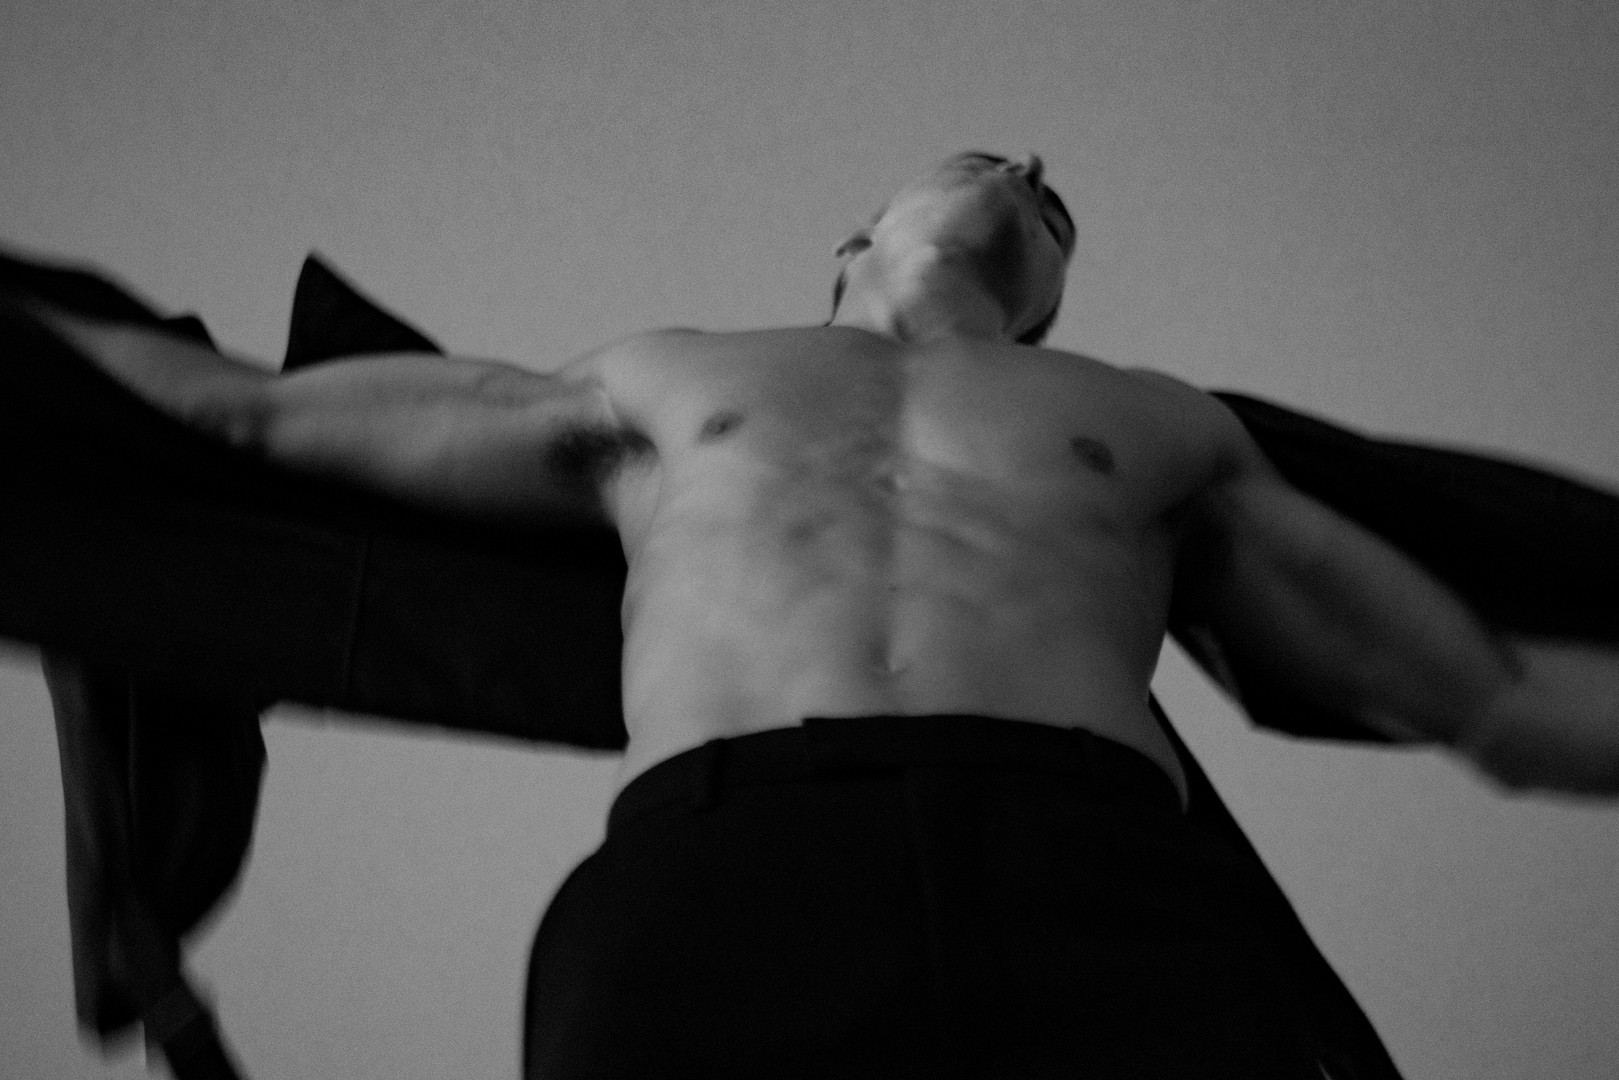 ESSENTIAL HOMMES | Alessio Pozzi by Leonardo Corredor